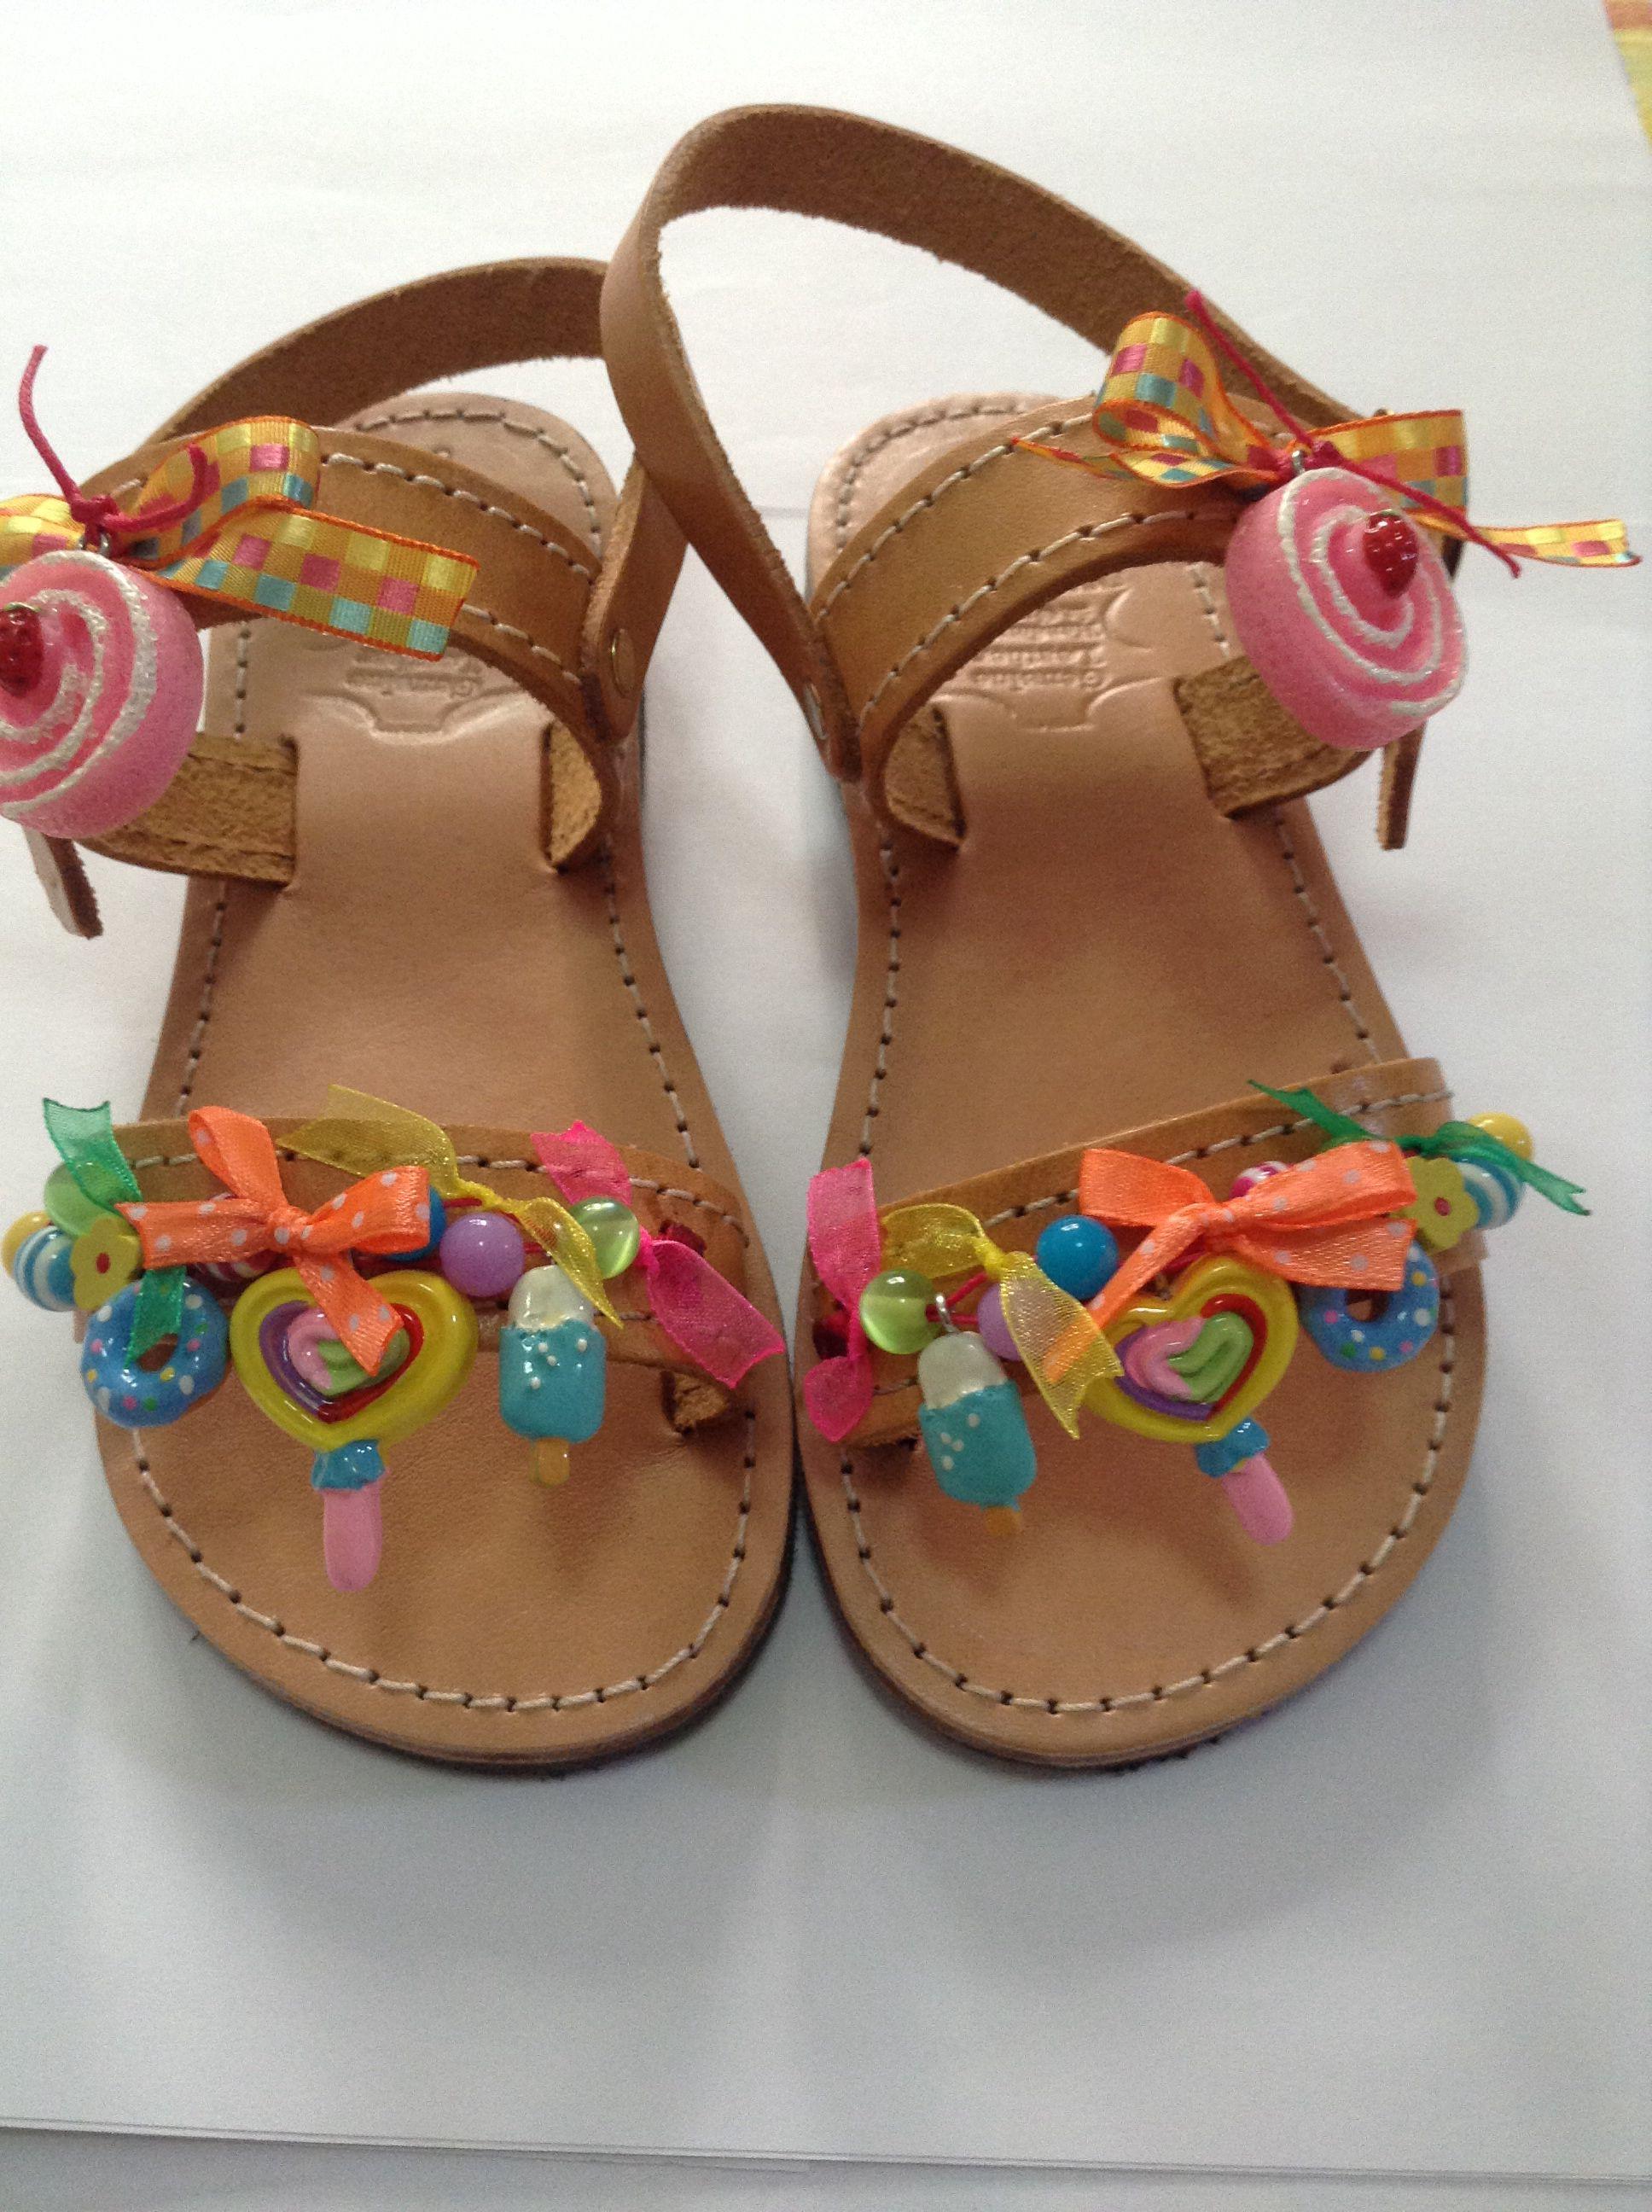 c63325e6e58 Παιδικες γλυκακια   Σαγιοναρες   Zapatos, Moda para niñas, Zapatos ...